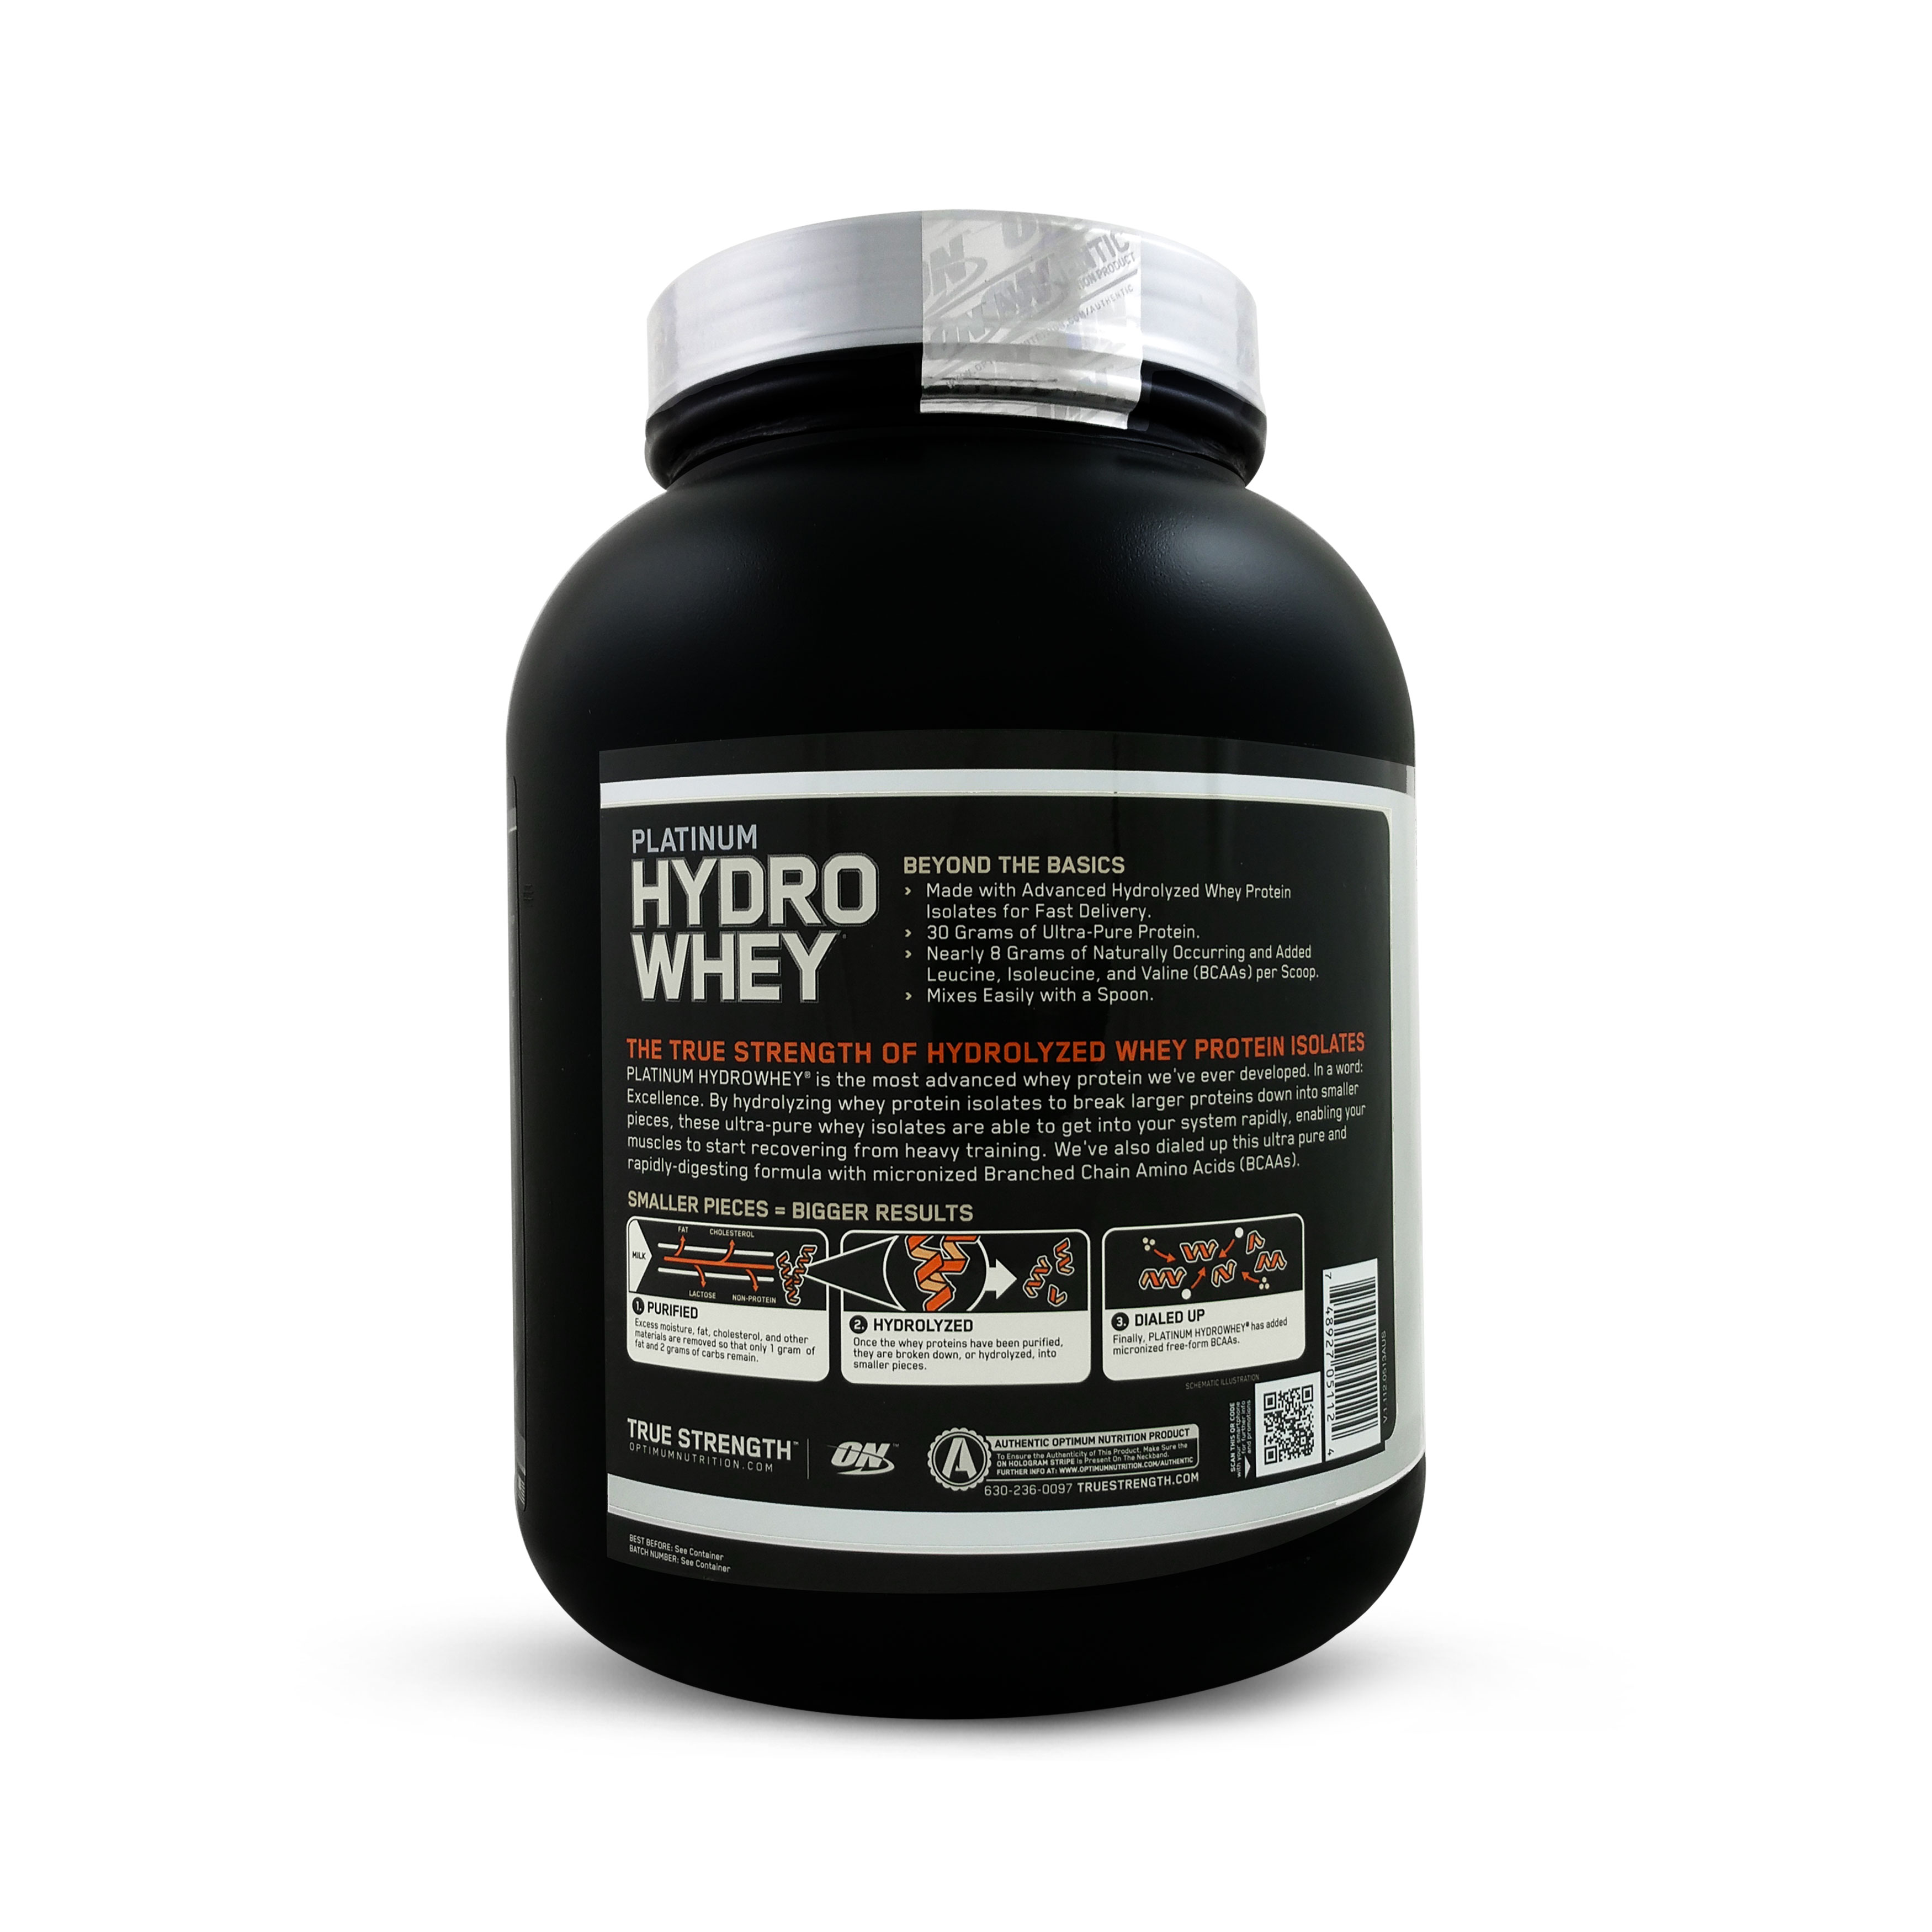 Optimum nutrition hydrowhey platinum